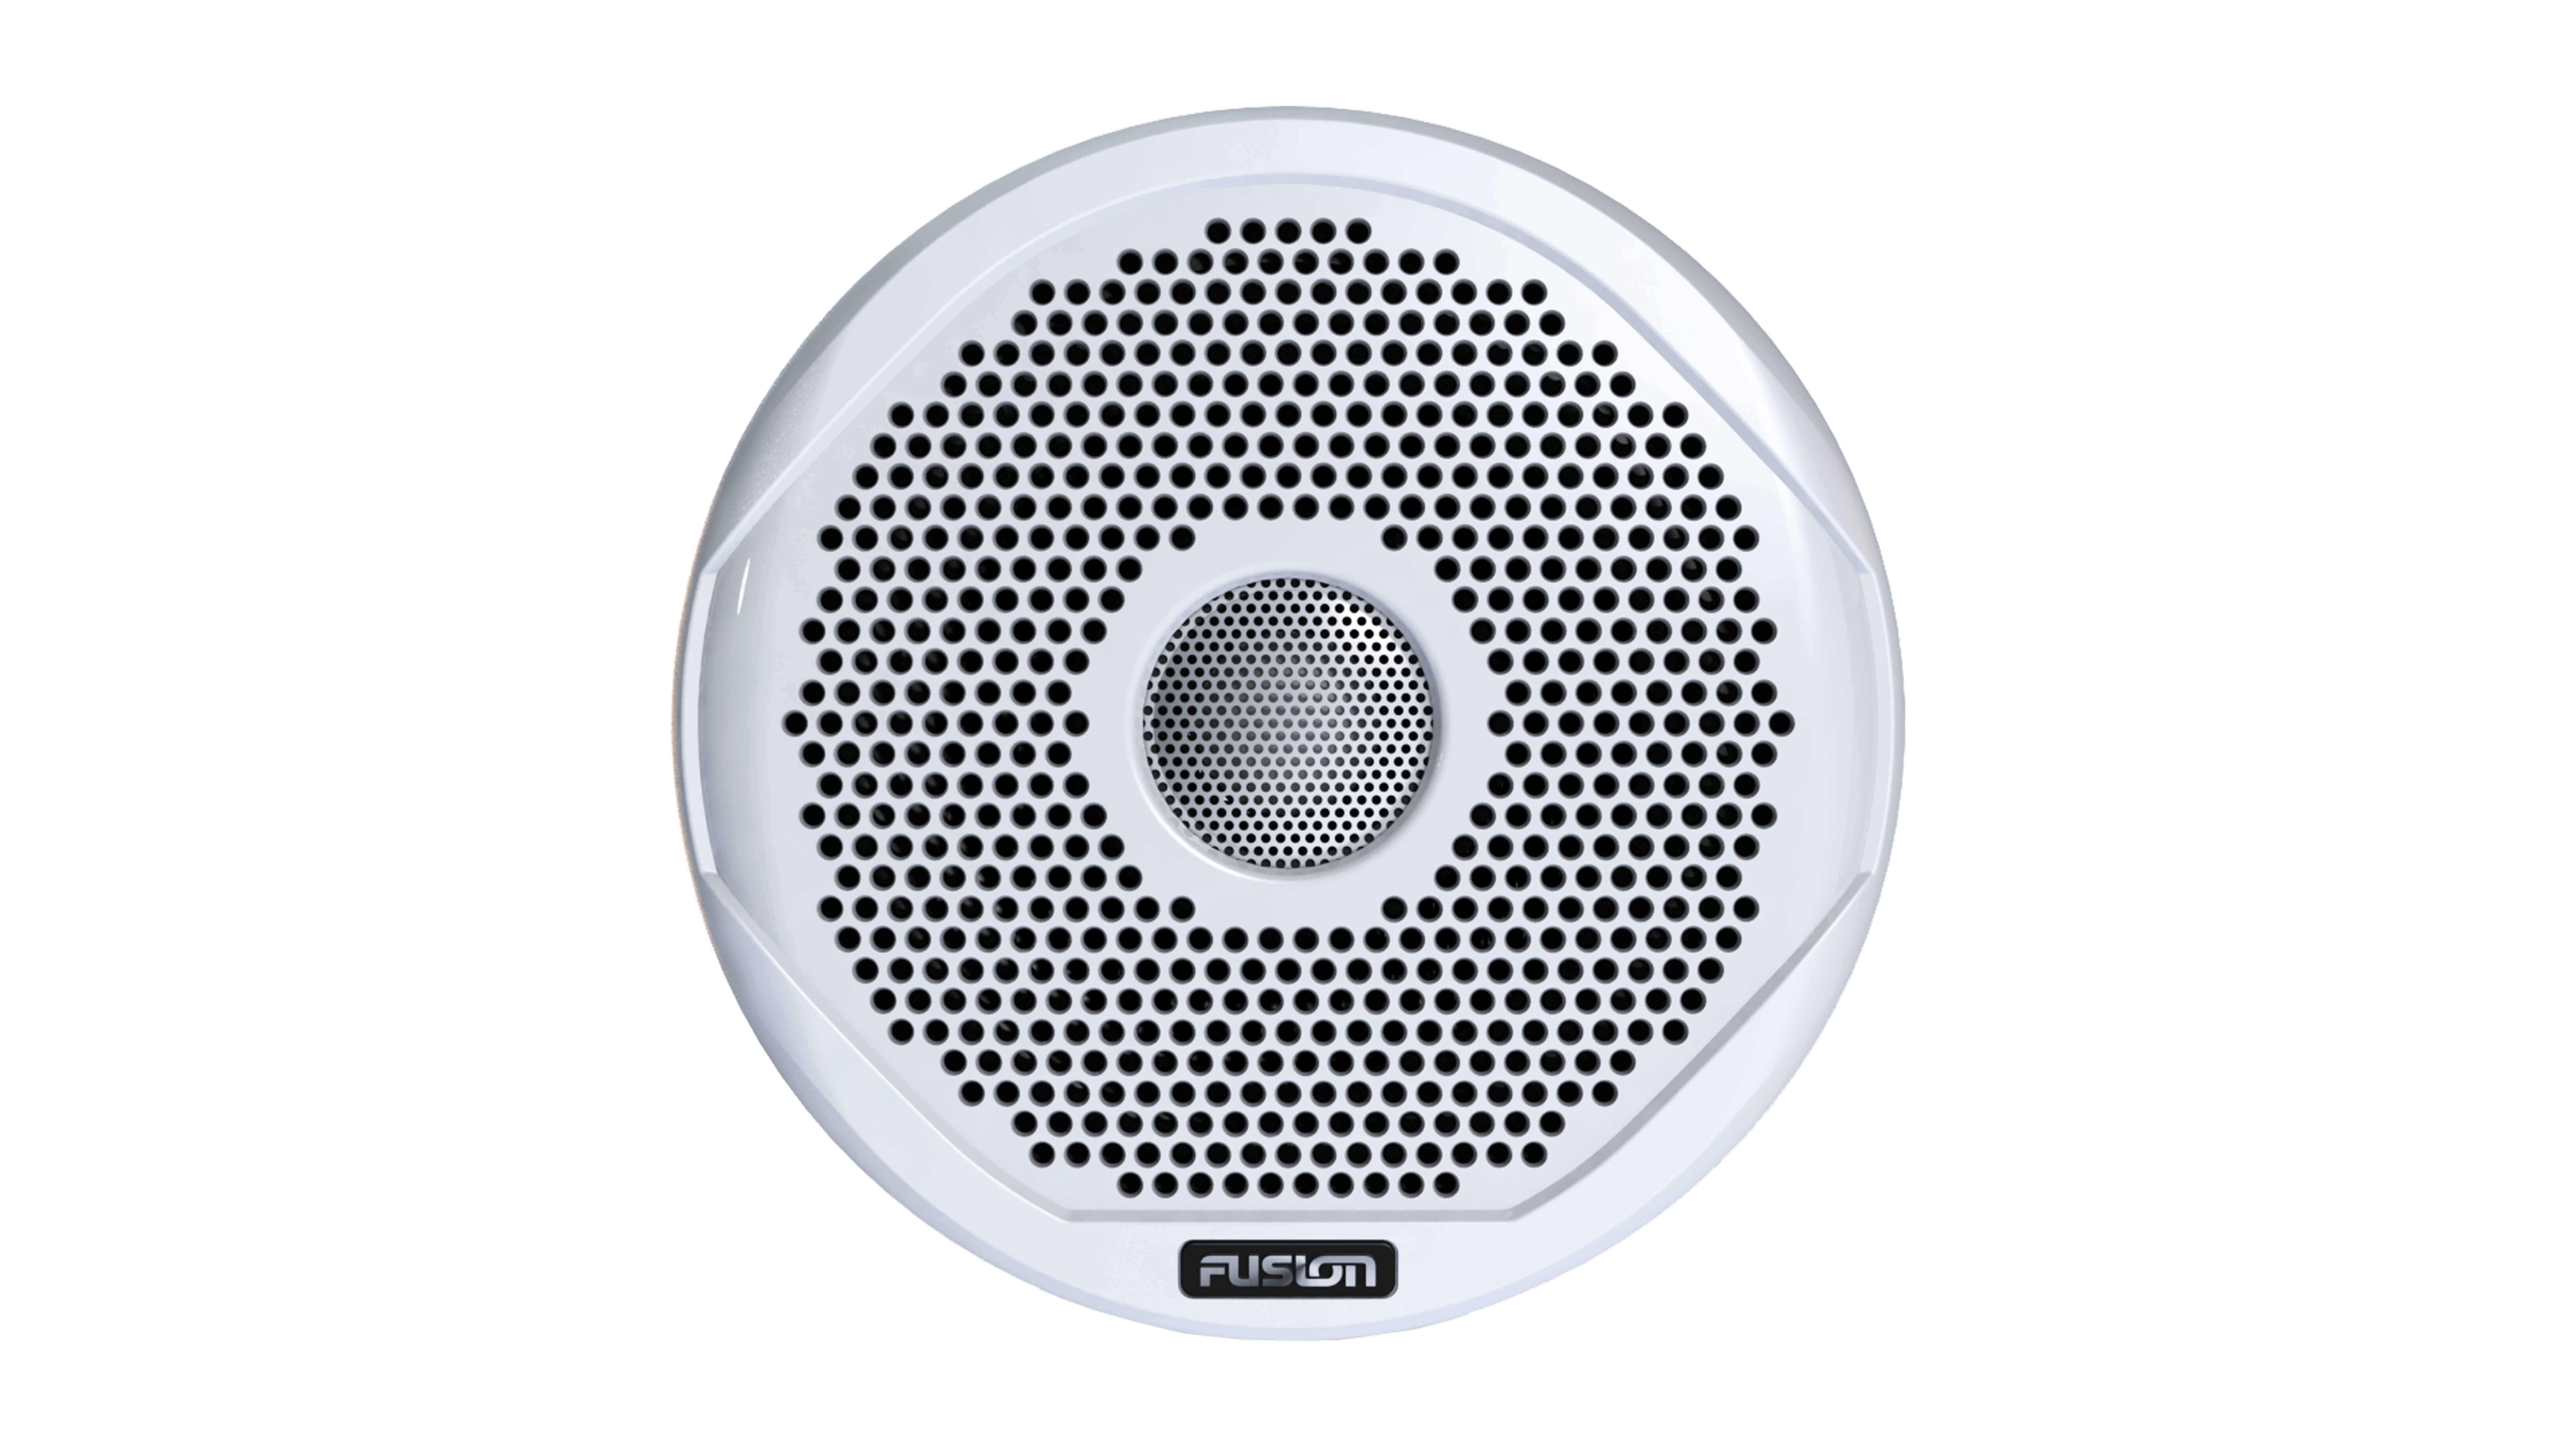 fusion ms fr4021 6021 7021 speaker white front